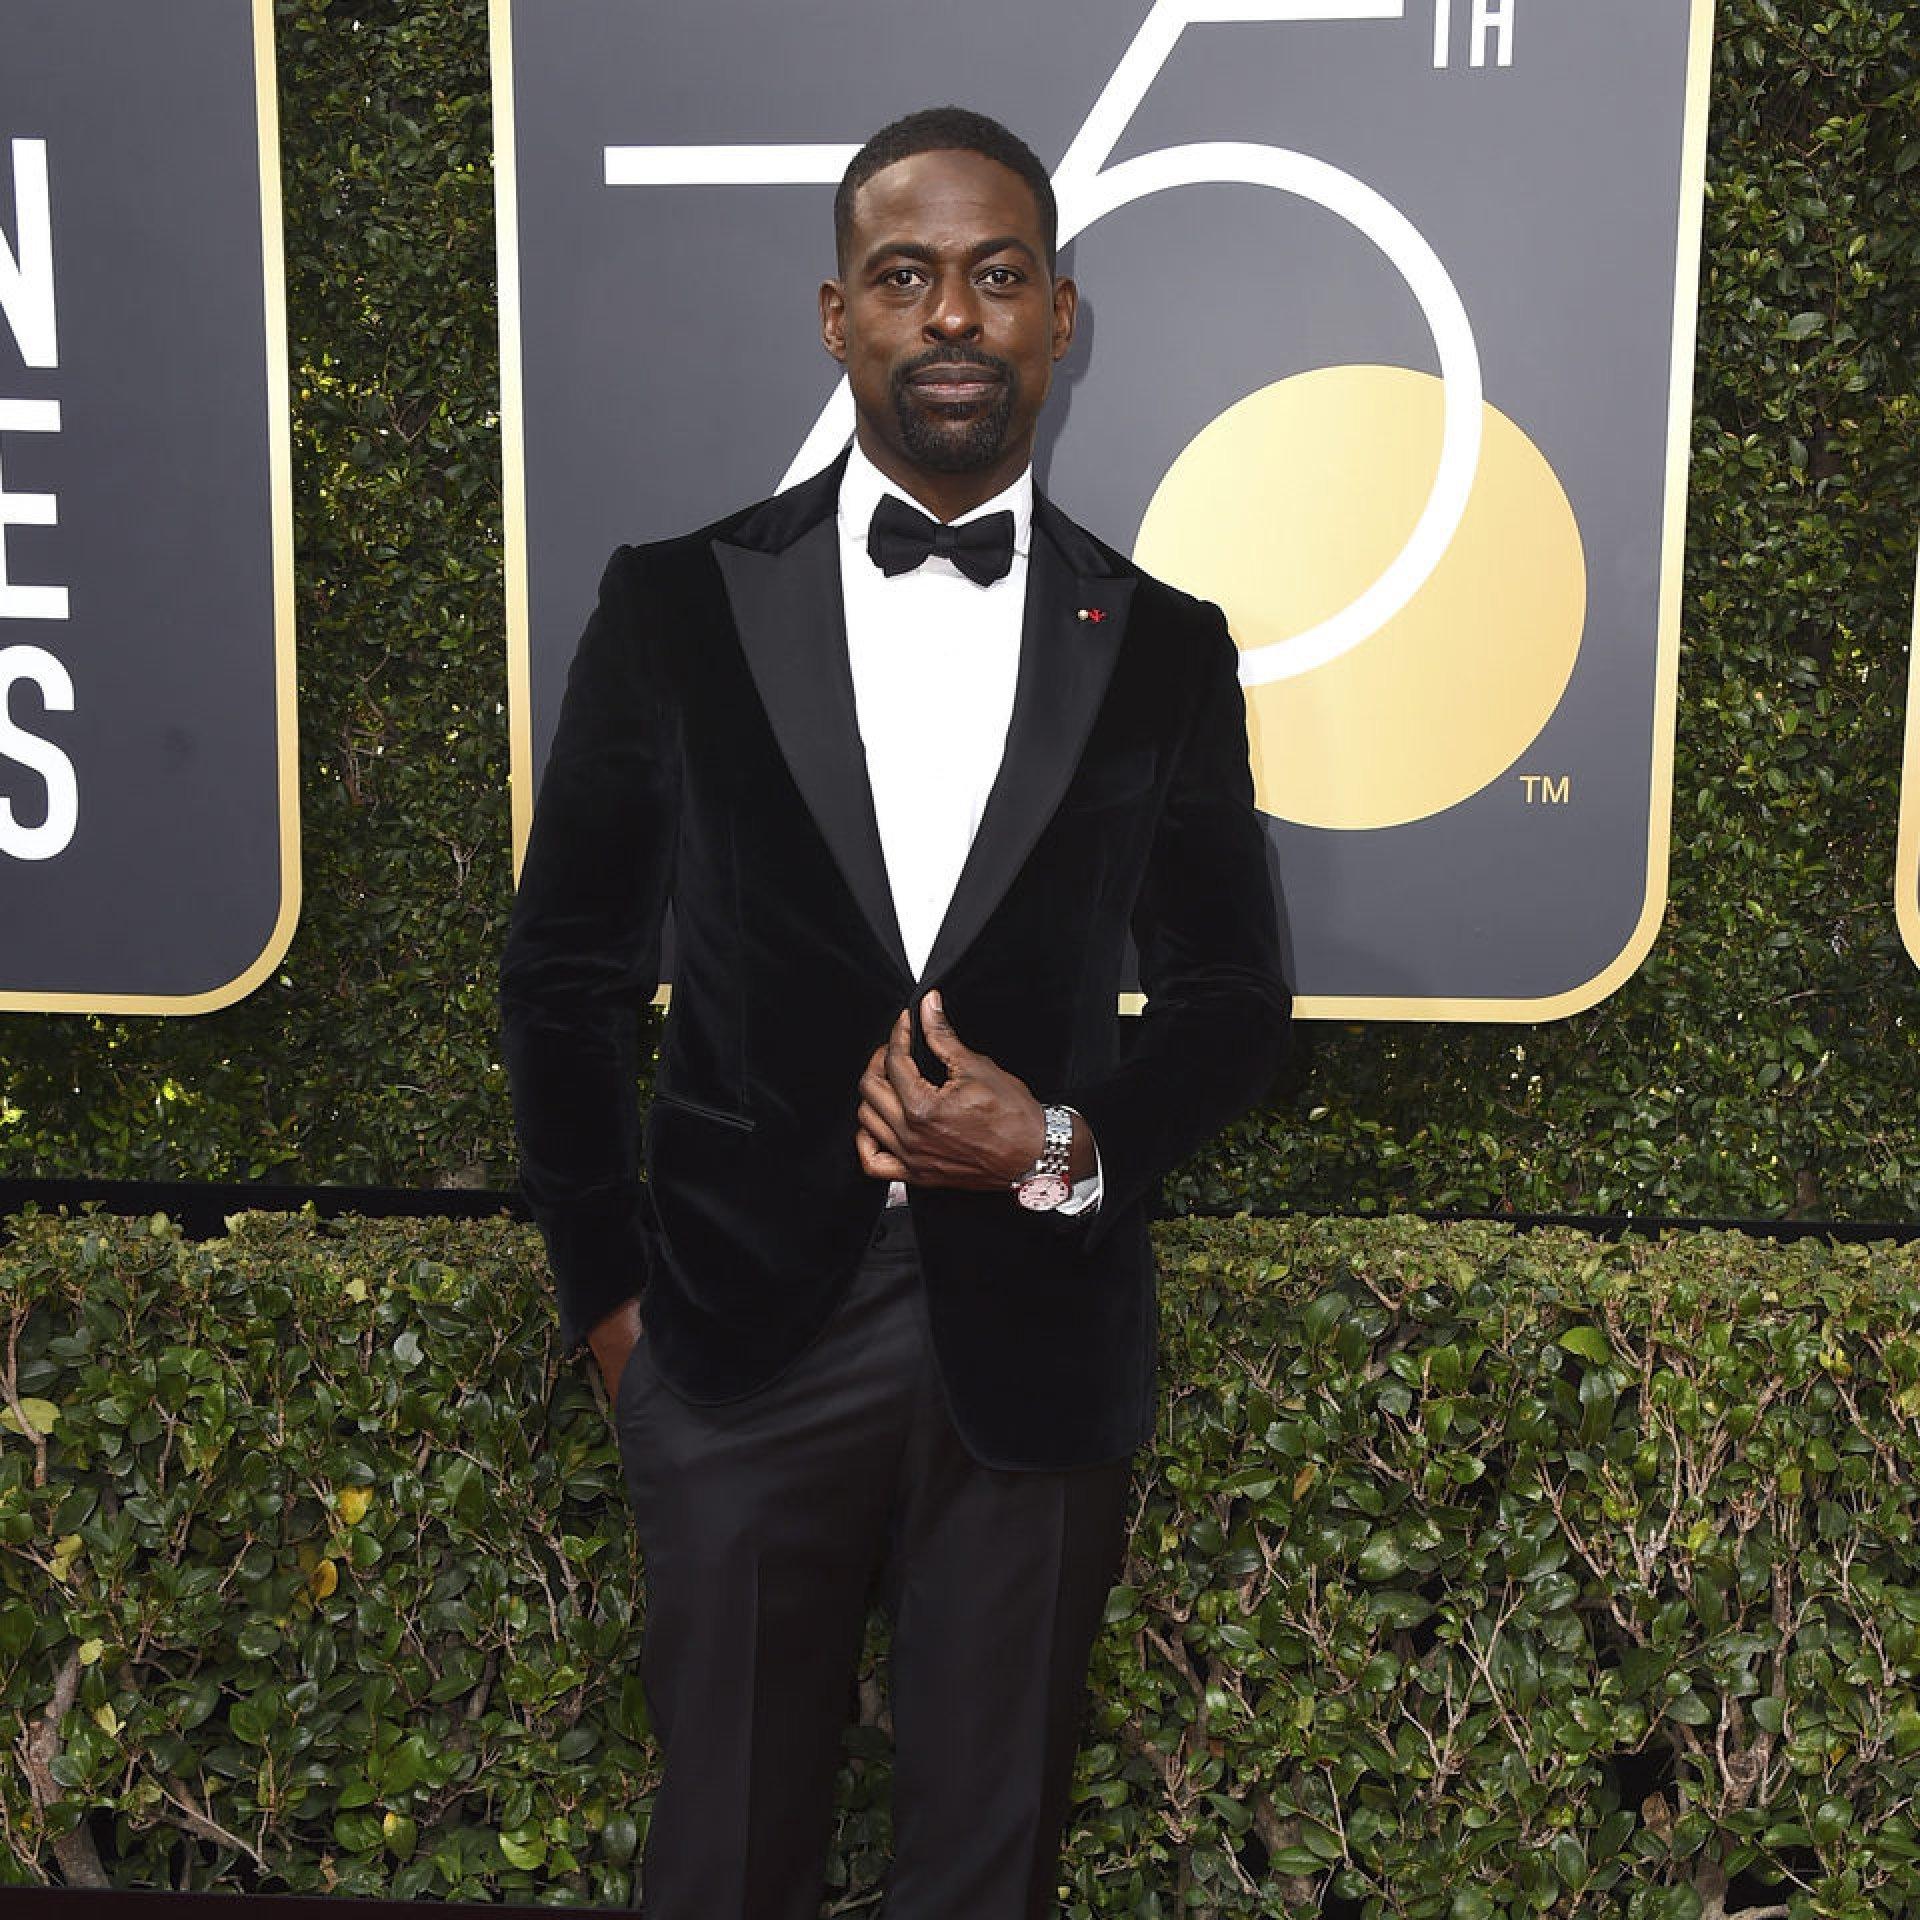 Golden Globe Stylist, Los Angeles